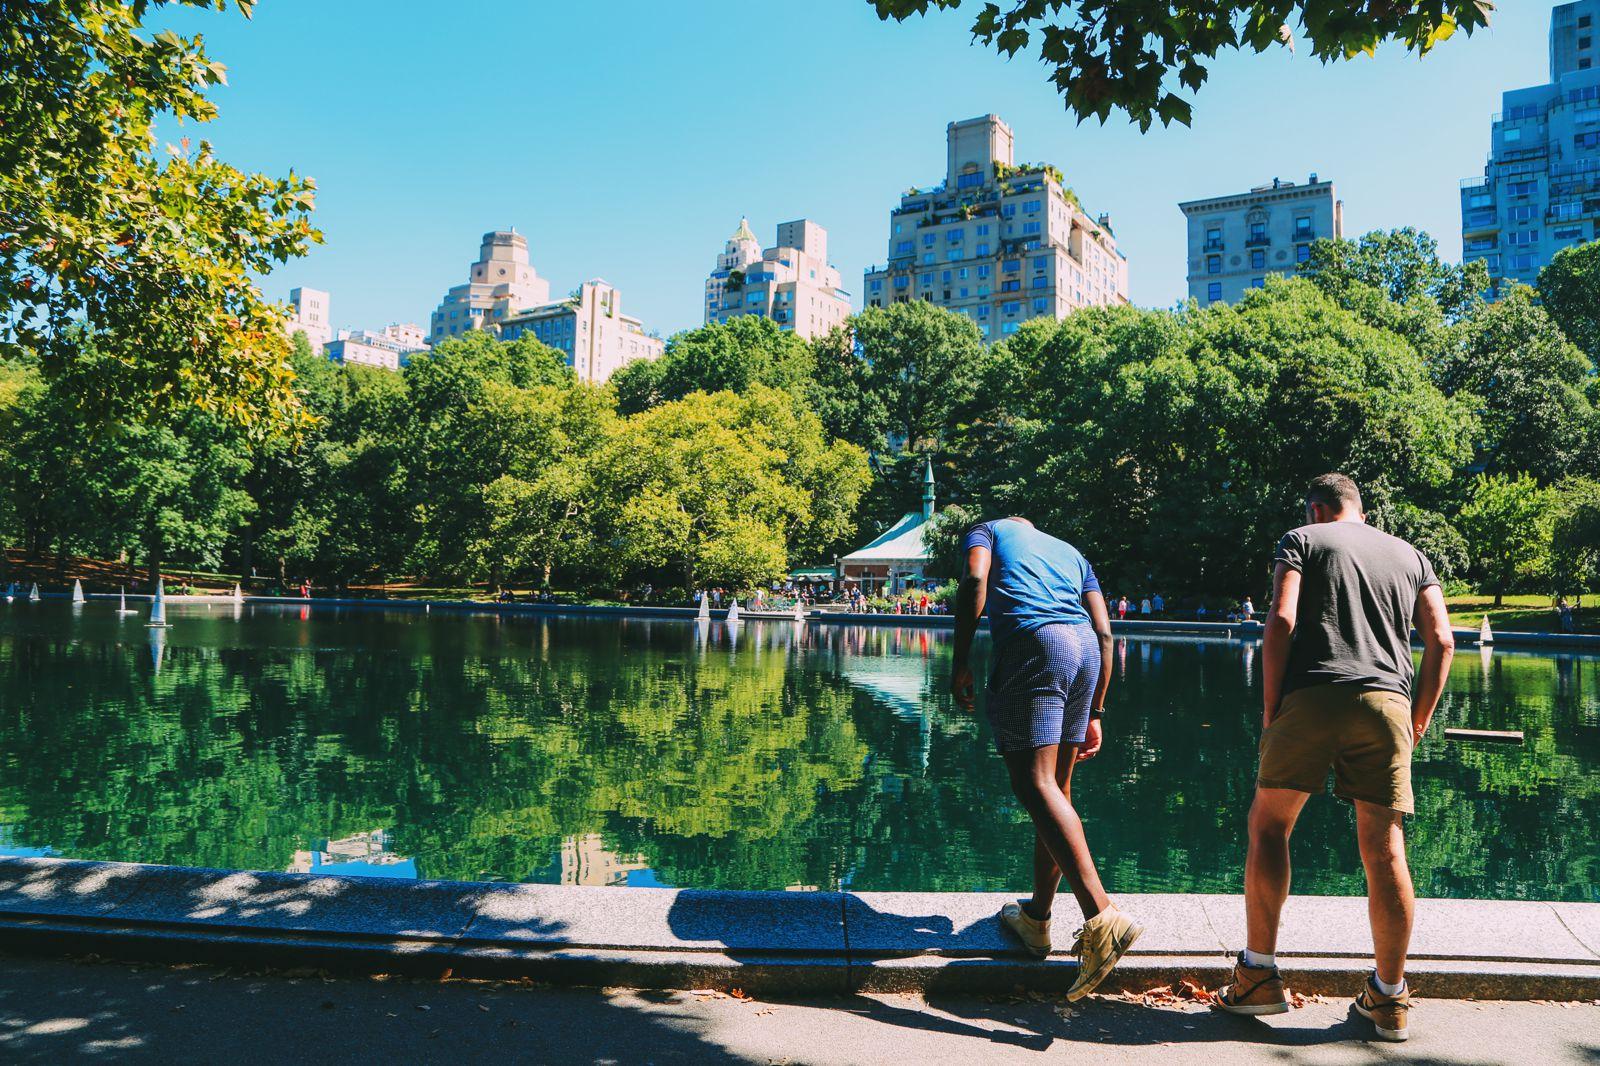 Central Park - A New York Photo Diary (4)